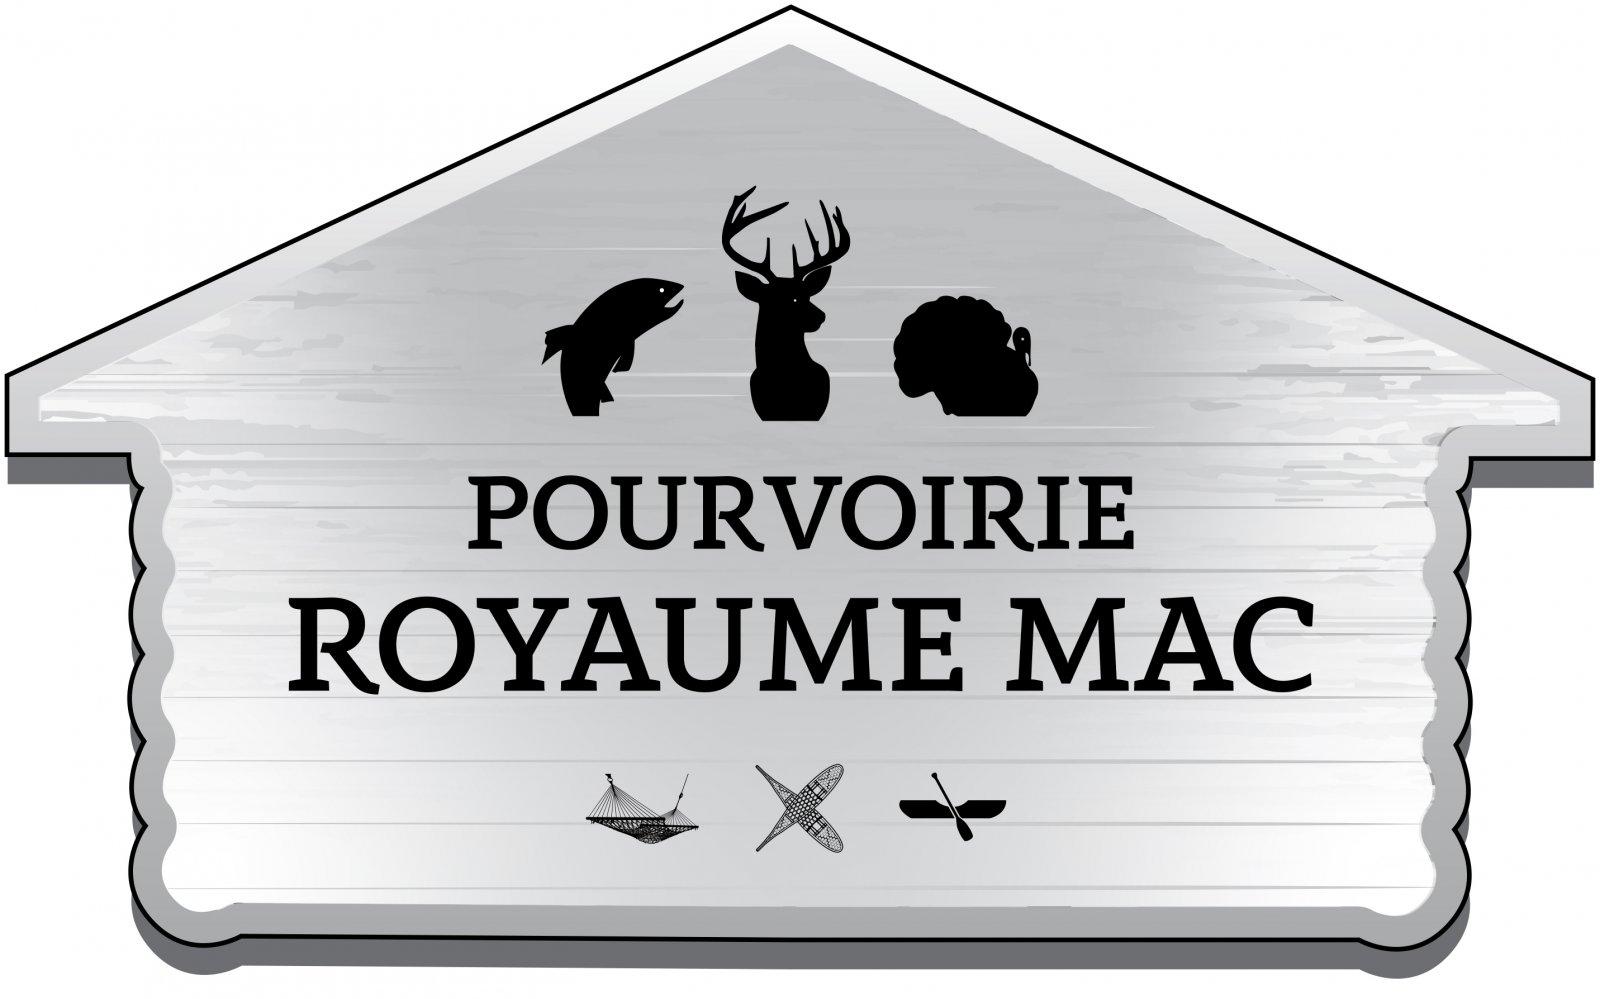 Pourvoirie Royaume Mac